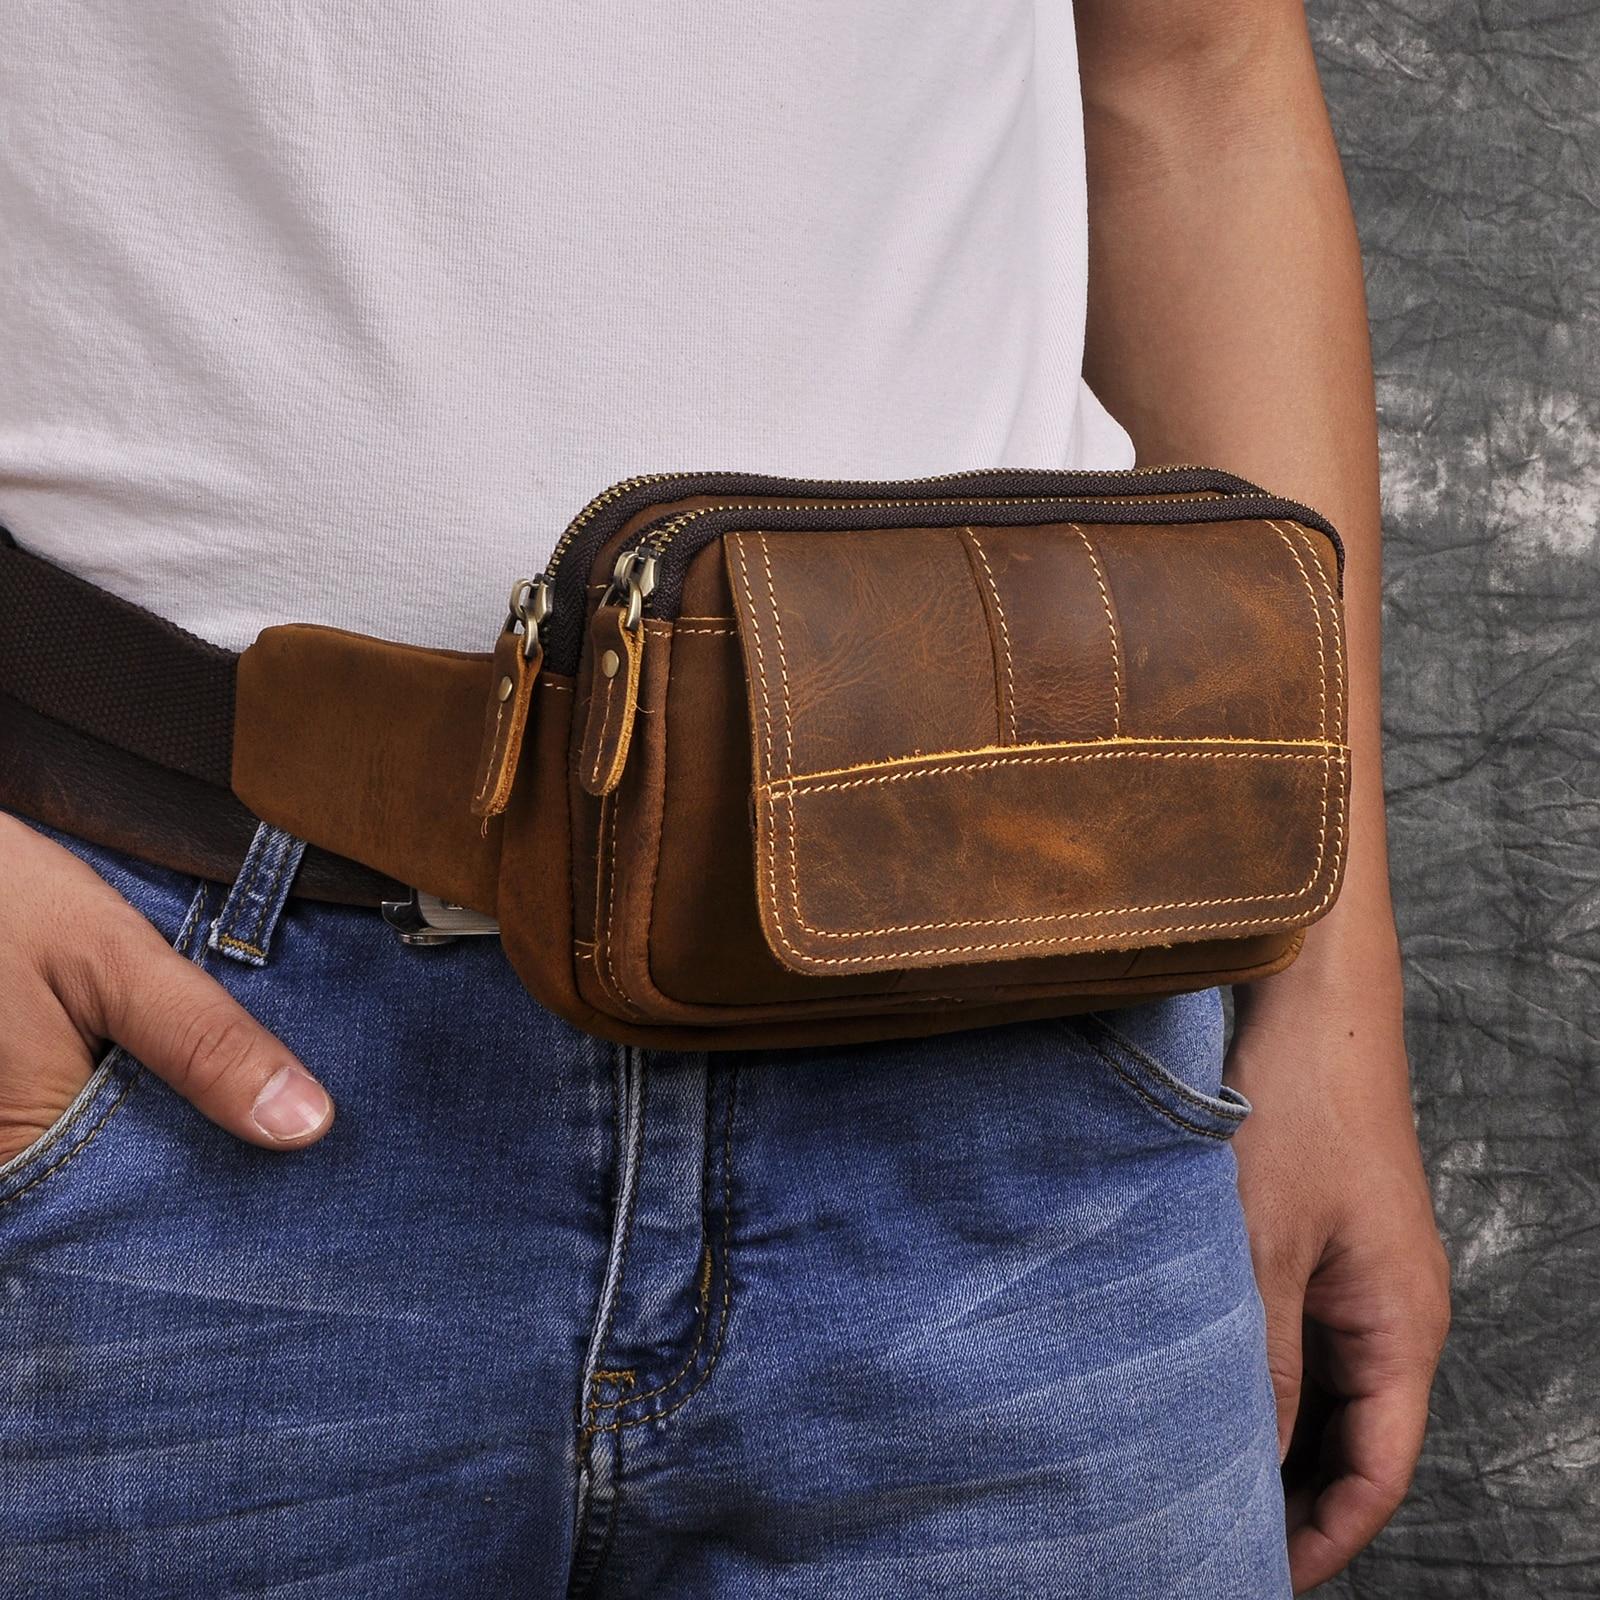 Quality Leather Men Casual Fashion Travel Crossbody Waist Belt Bag Chest Sling Bag Cowhide Design Phone Cigarette Pouch 341-b